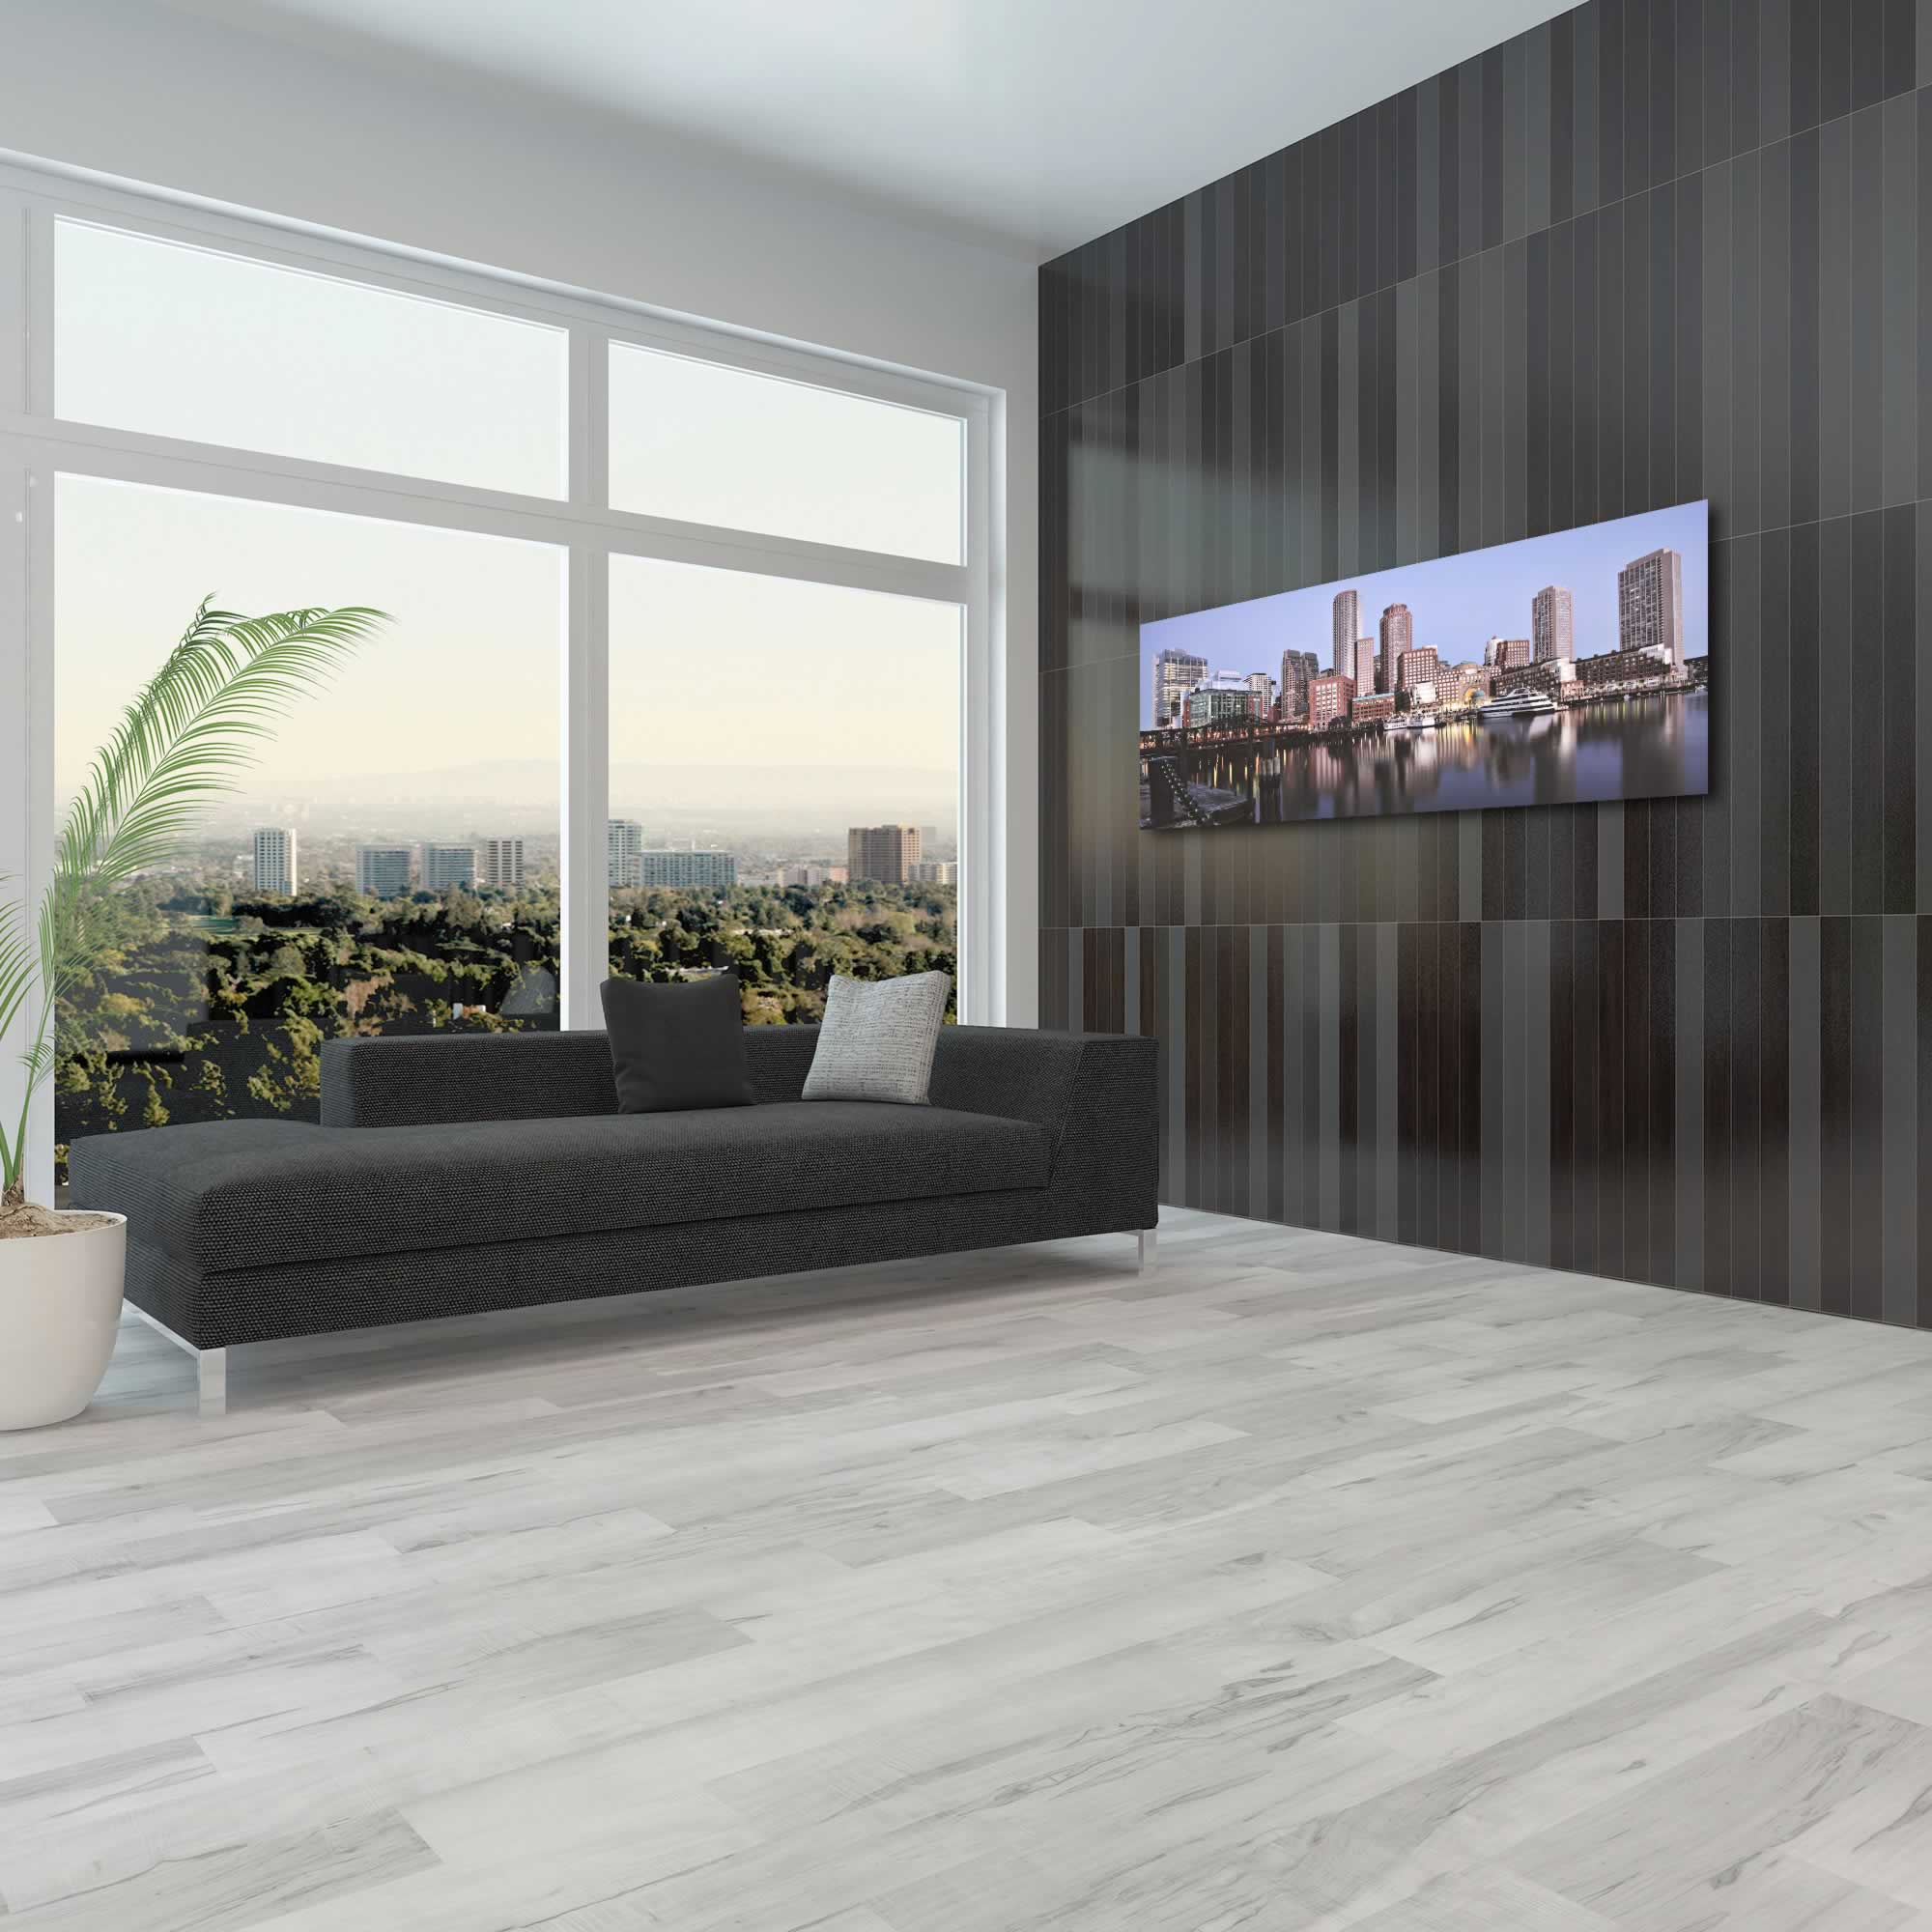 Boston City Skyline - Urban Modern Art, Designer Home Decor, Cityscape Wall Artwork, Trendy Contemporary Art - Alternate View 3